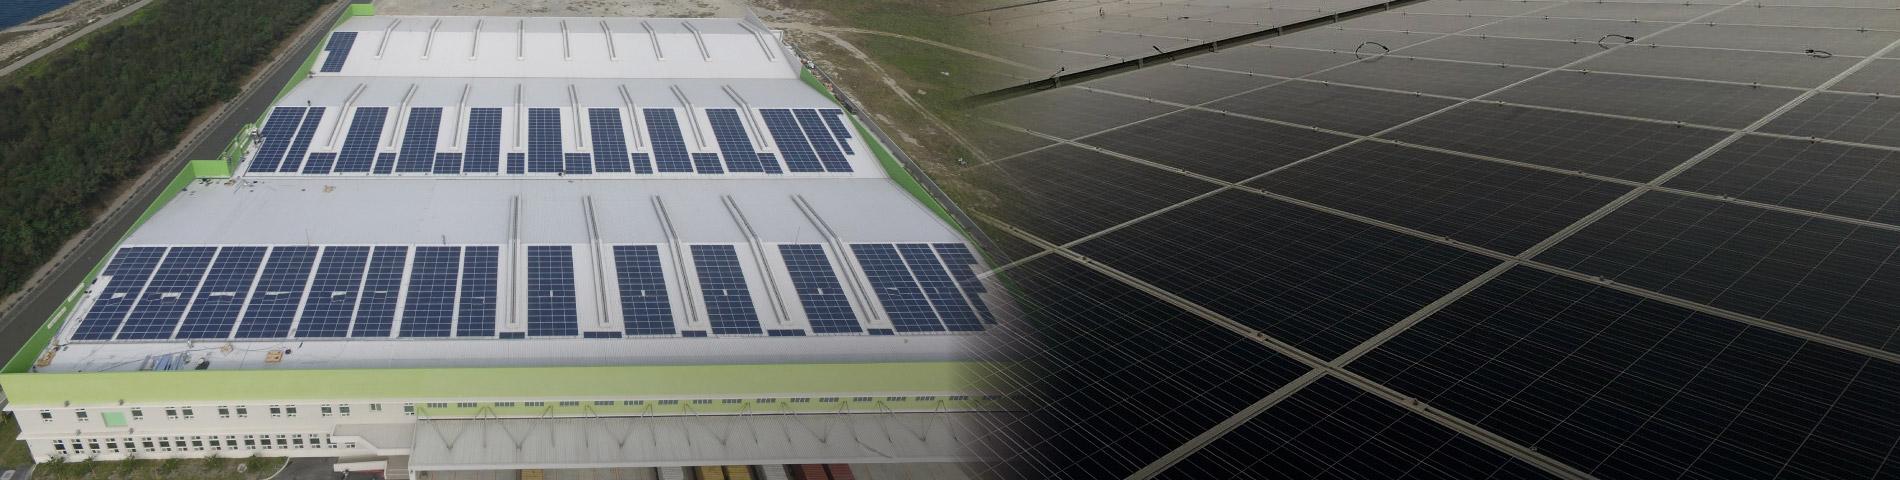 Solar Panels Power Equipment